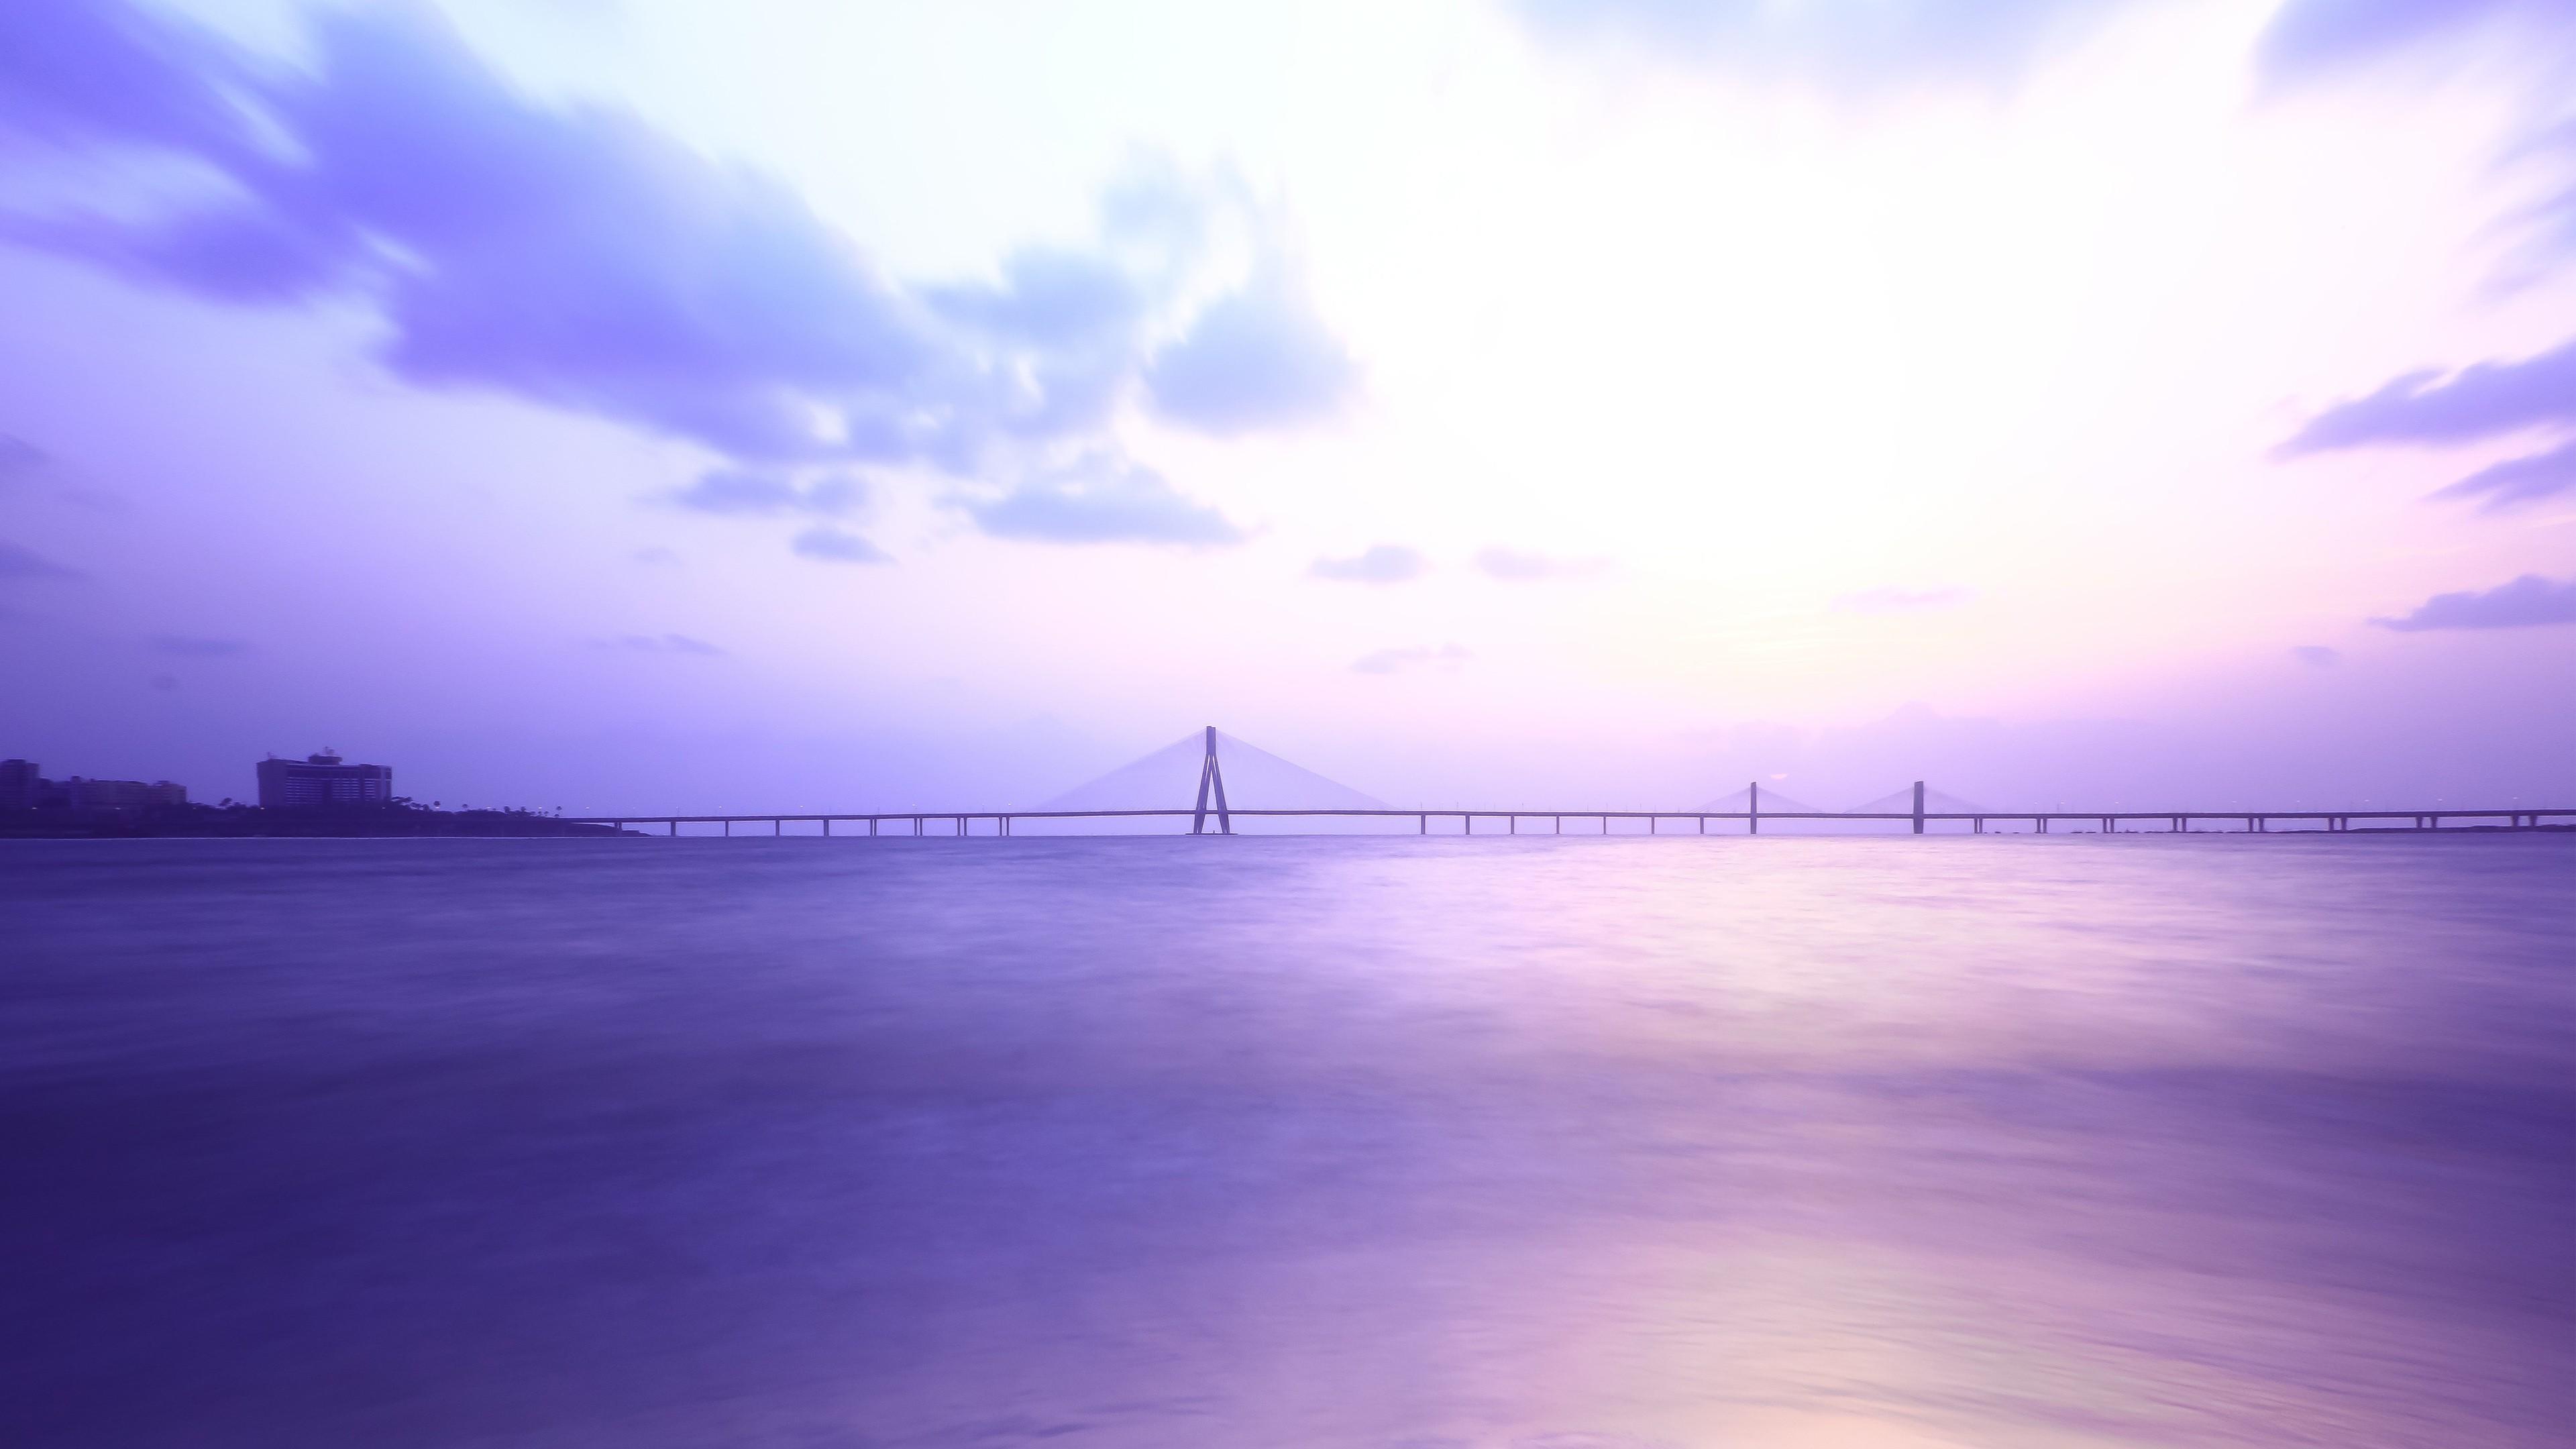 2048x1152 Shivaji Park Bridge India 2048x1152 Resolution